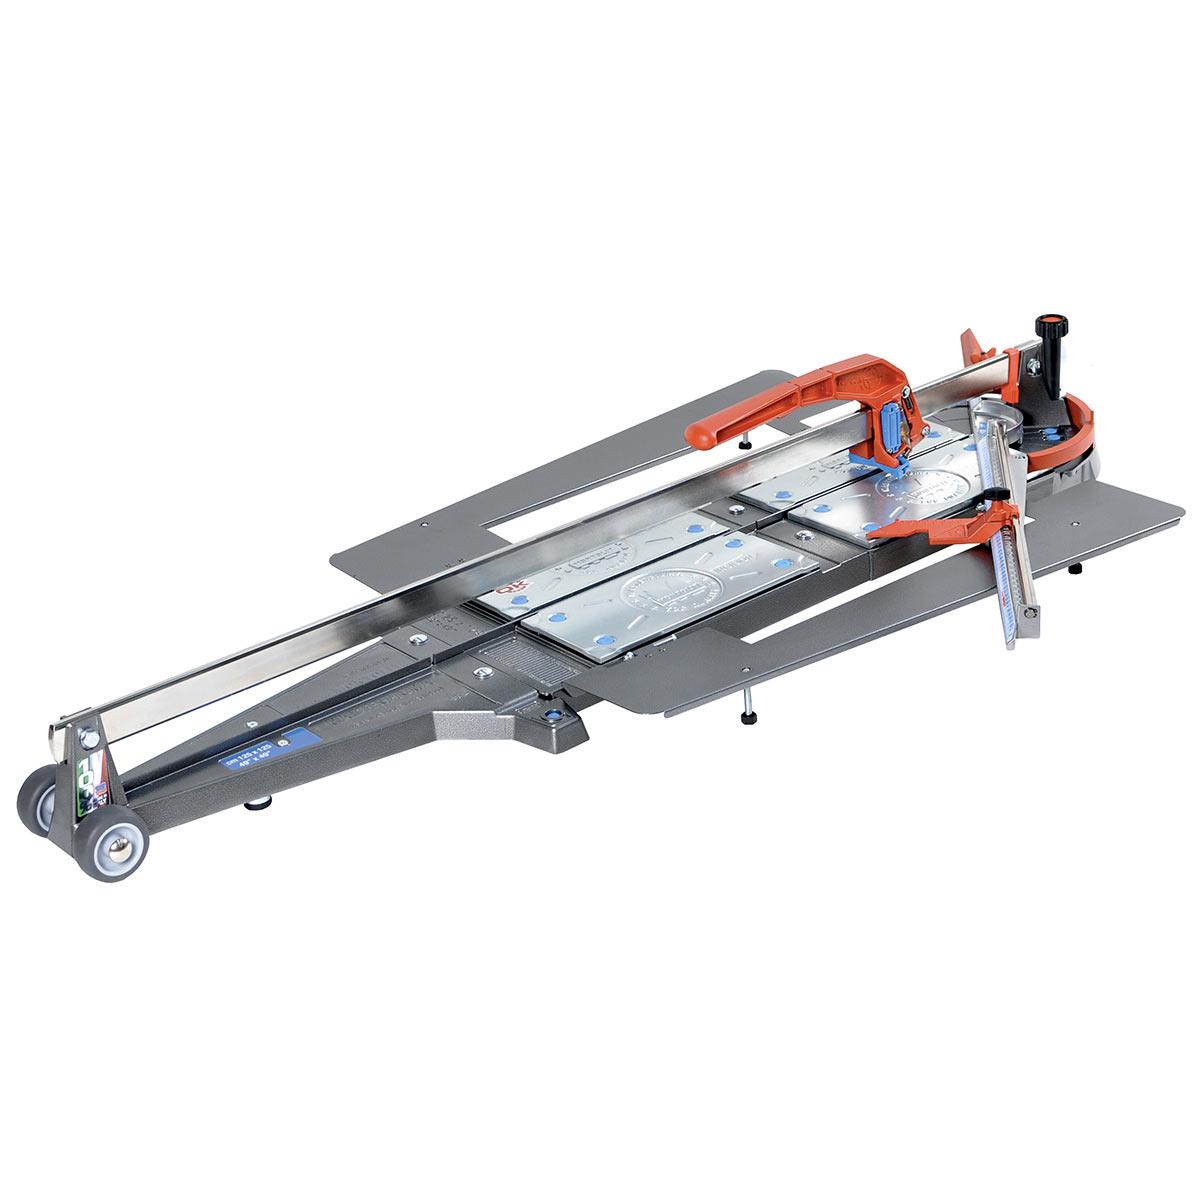 6363 montolit masterpiuma evolution 3 push tile cutter